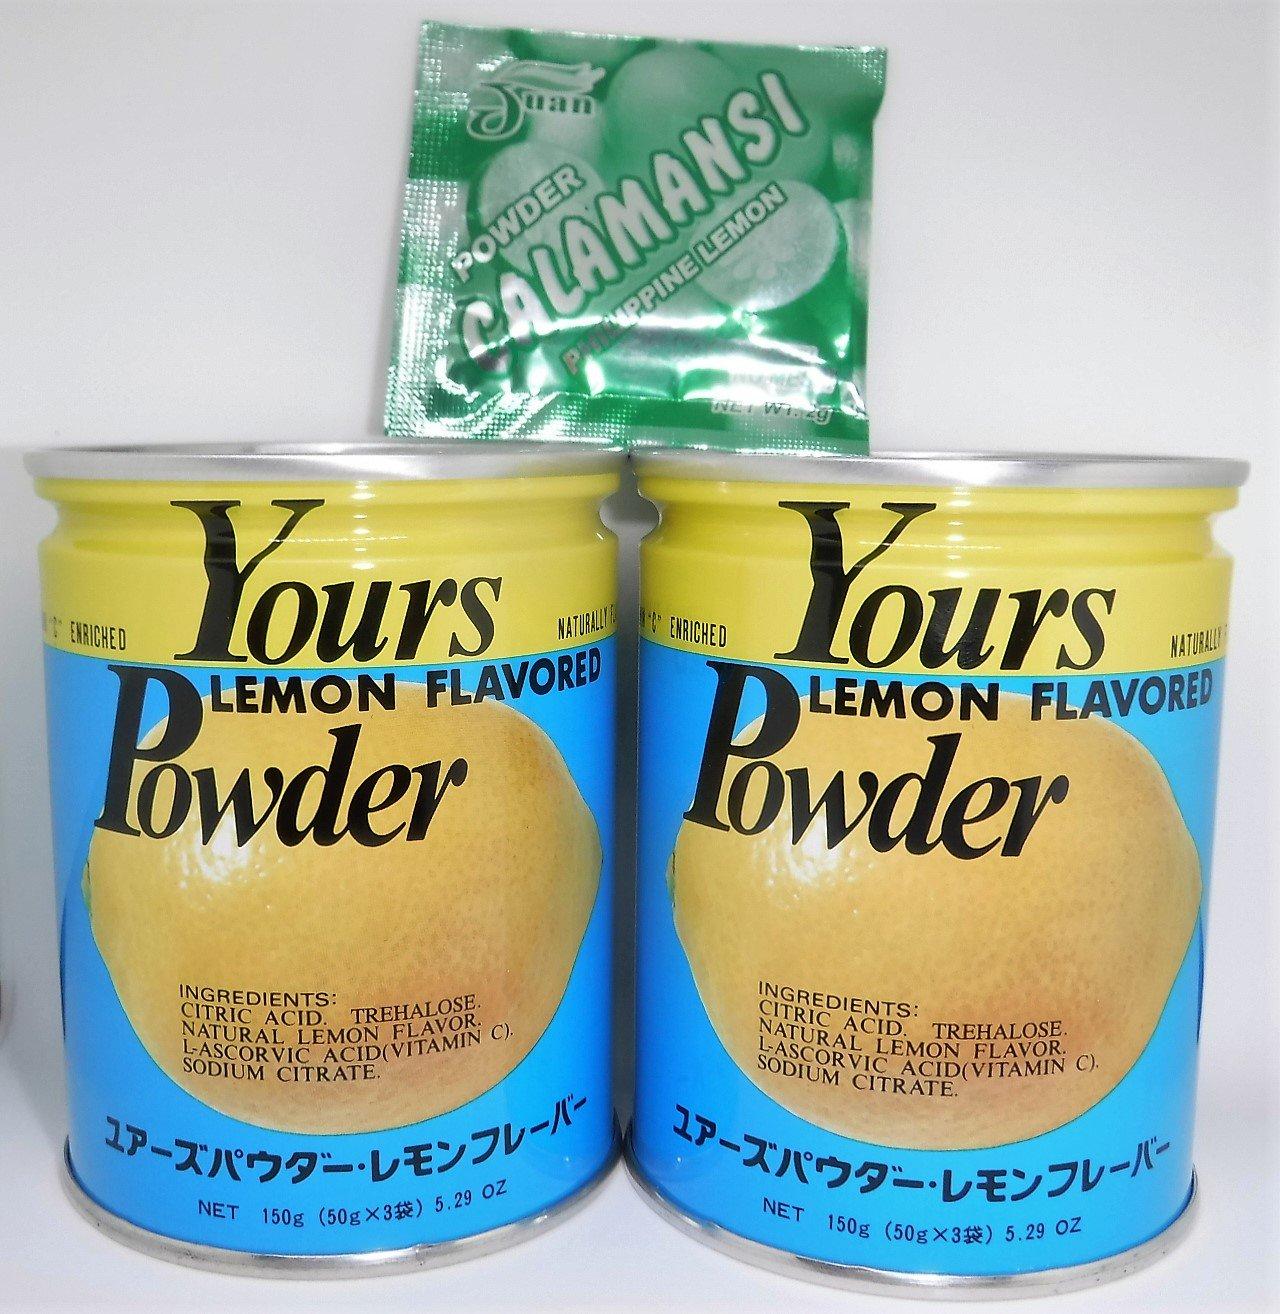 Yours (Japan) Lemon Flavored Powder, 5.2 oz. / 2 cans + Philippine Lemon Calamansi Salmpler Sachet